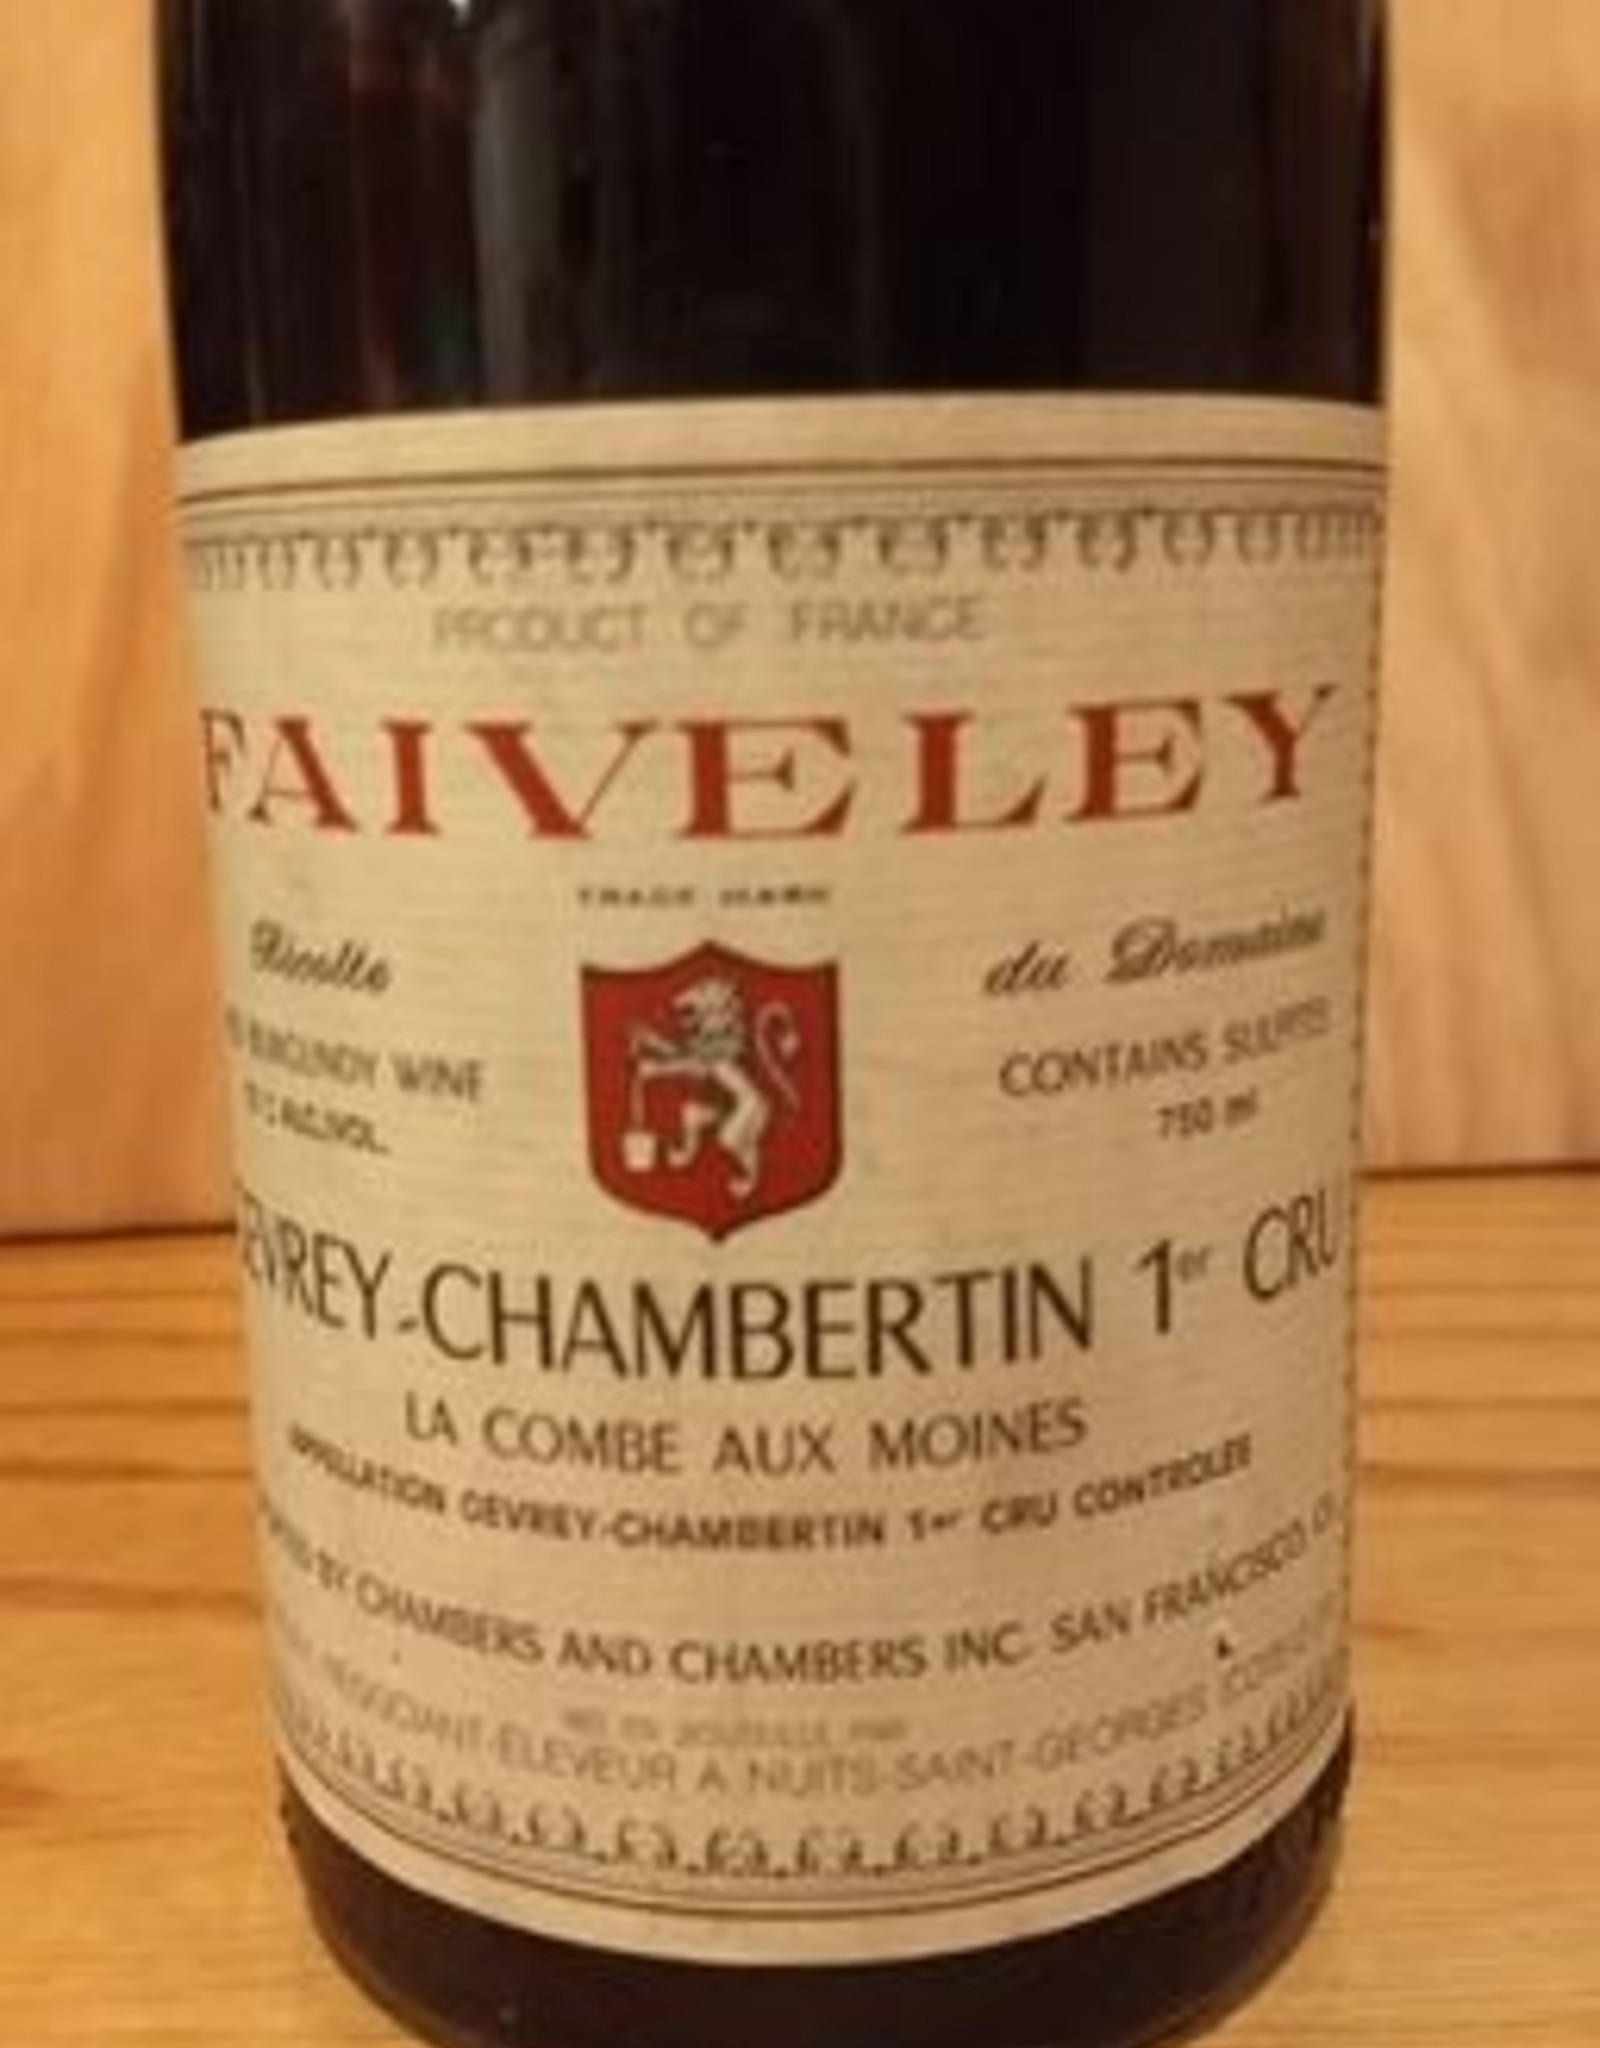 Faiveley Gevrey Chambertin 1er Cru  La Combe Aux Moines 1988